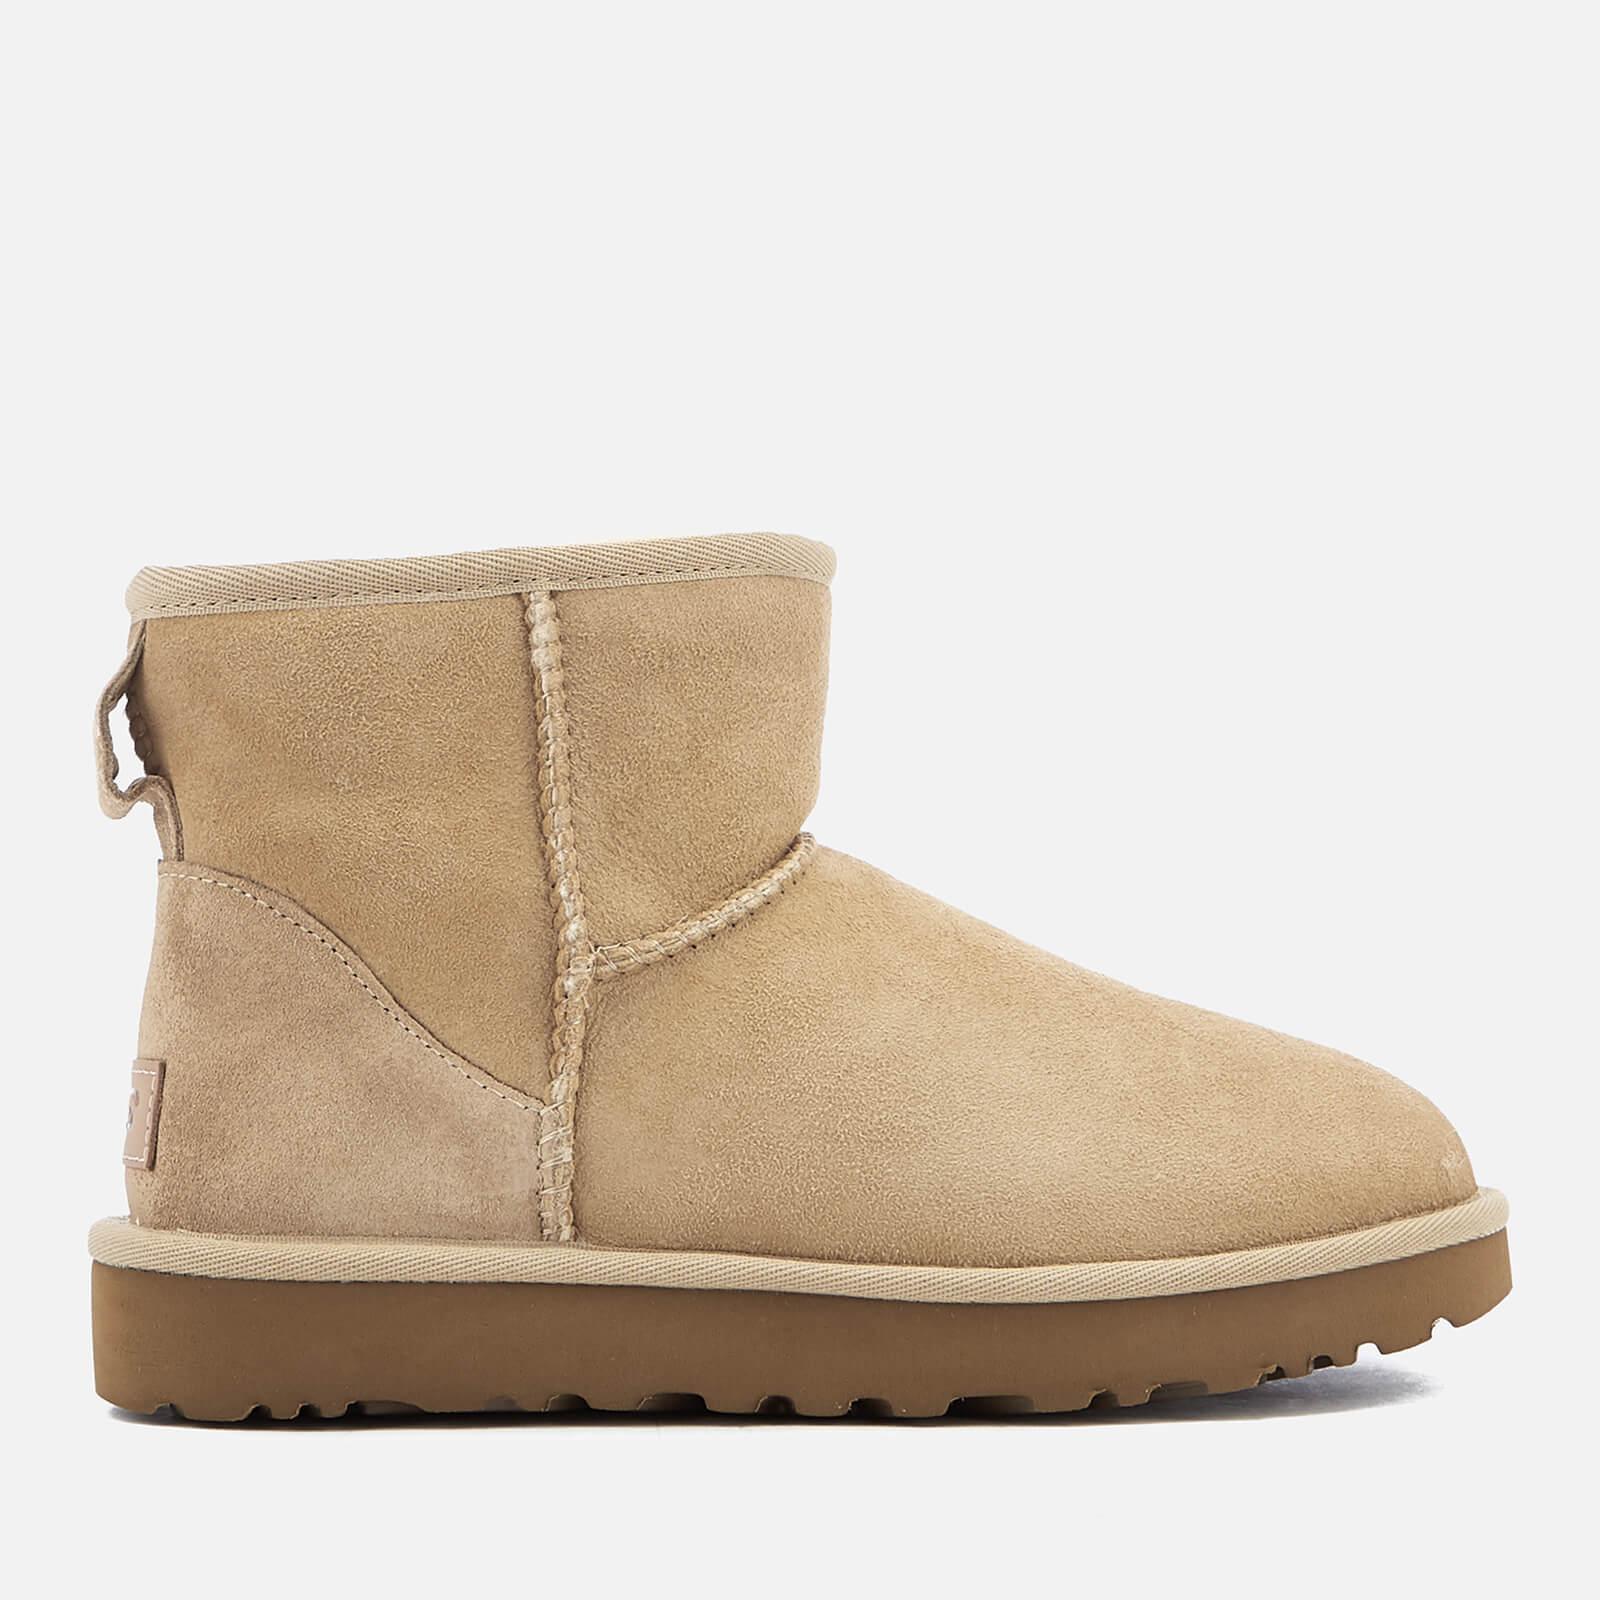 7b6789638c9 UGG Women's Classic Mini II Sheepskin Boots - Sand